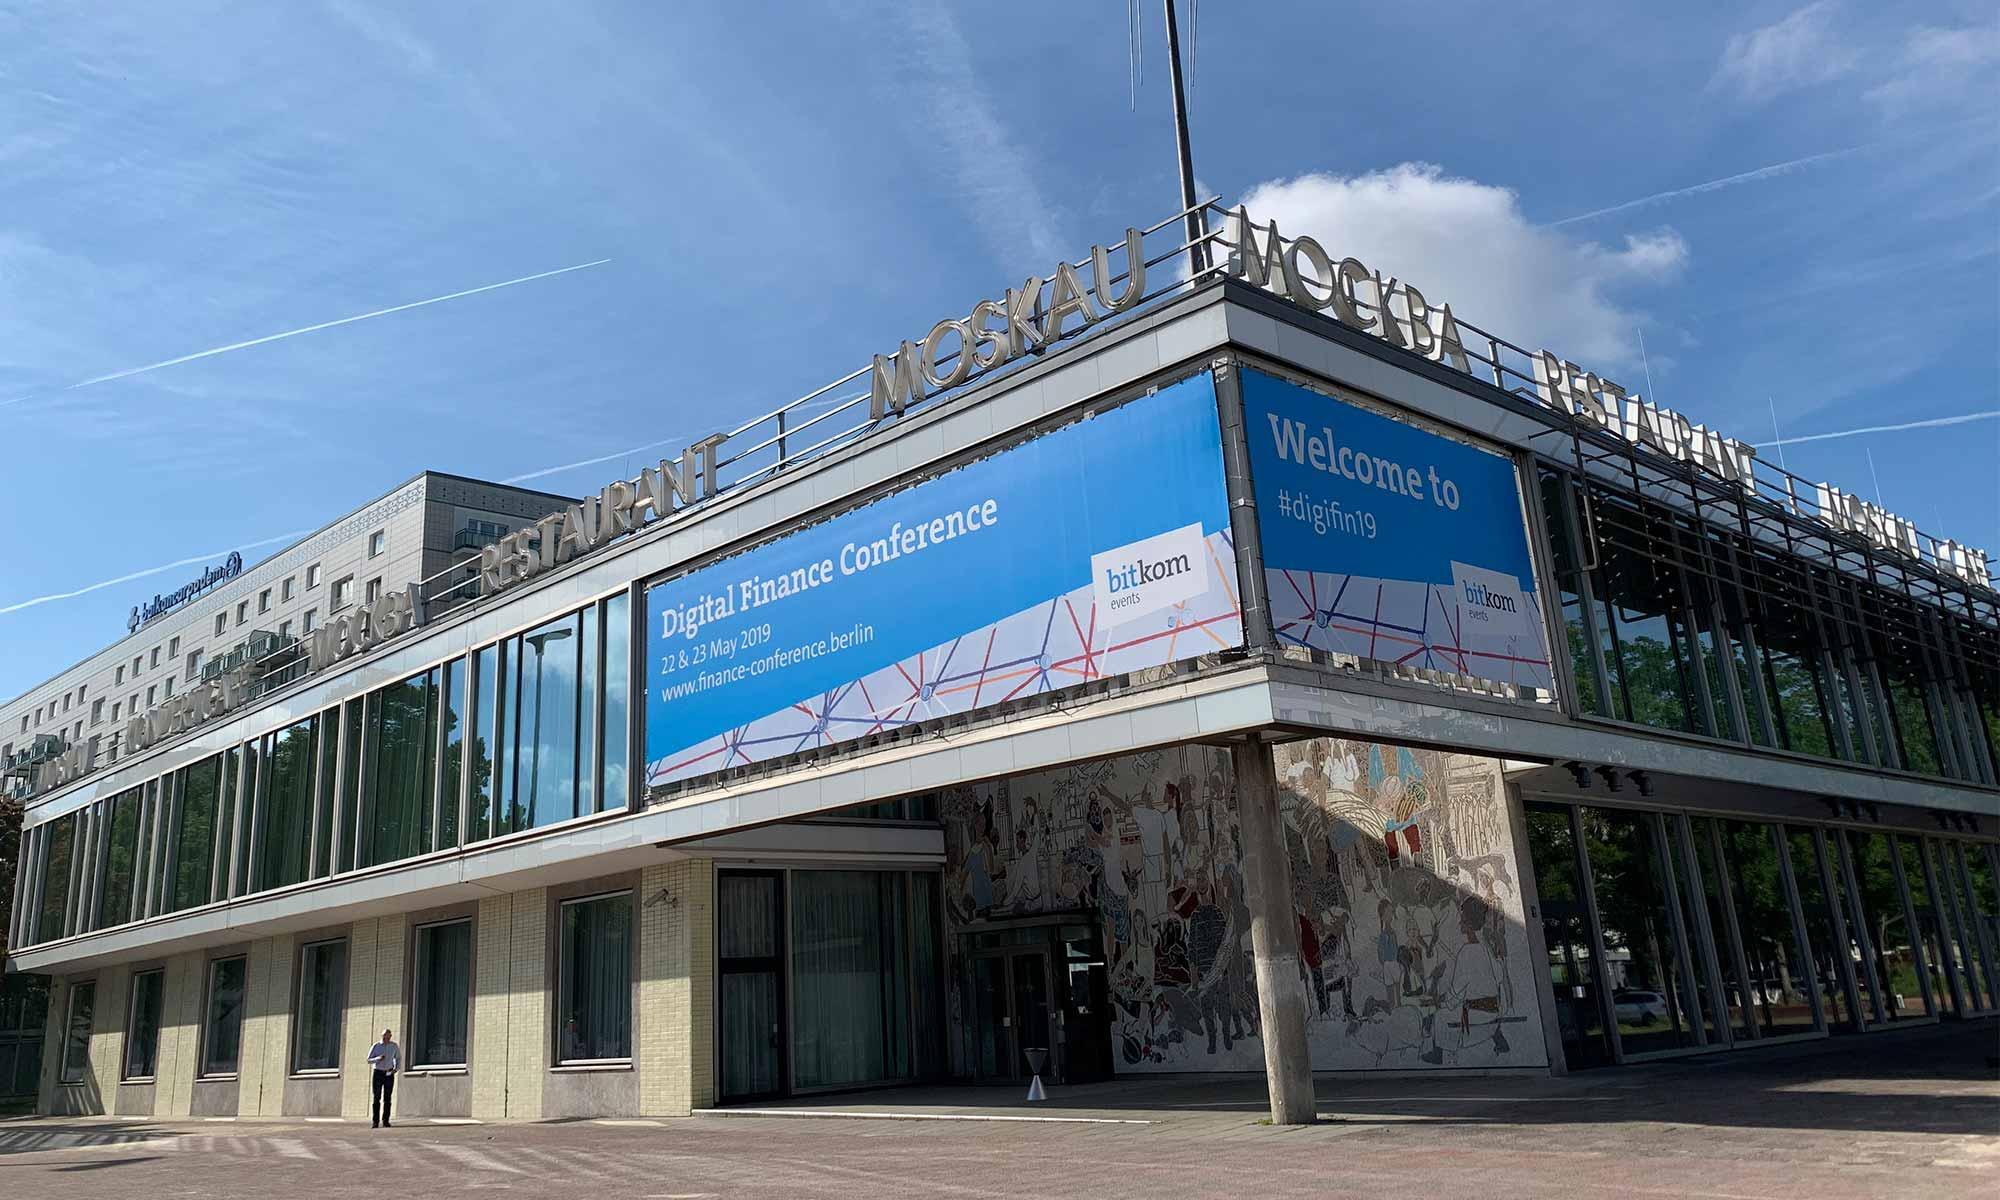 digifin19 Digital Finance Conference Berlin 2019 bsurance